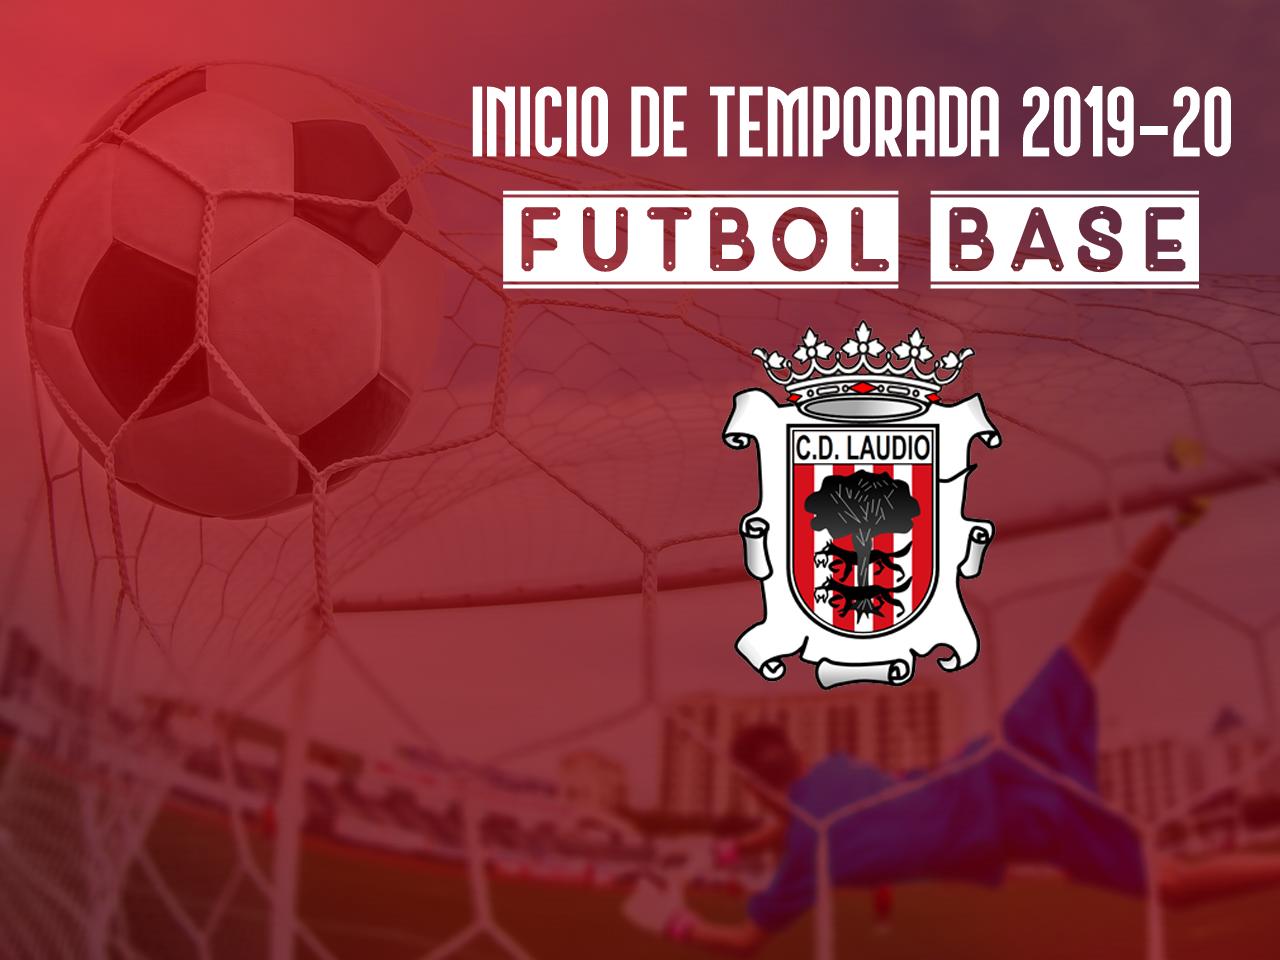 CLUB | Reuniones inicio de temporada 2019-20